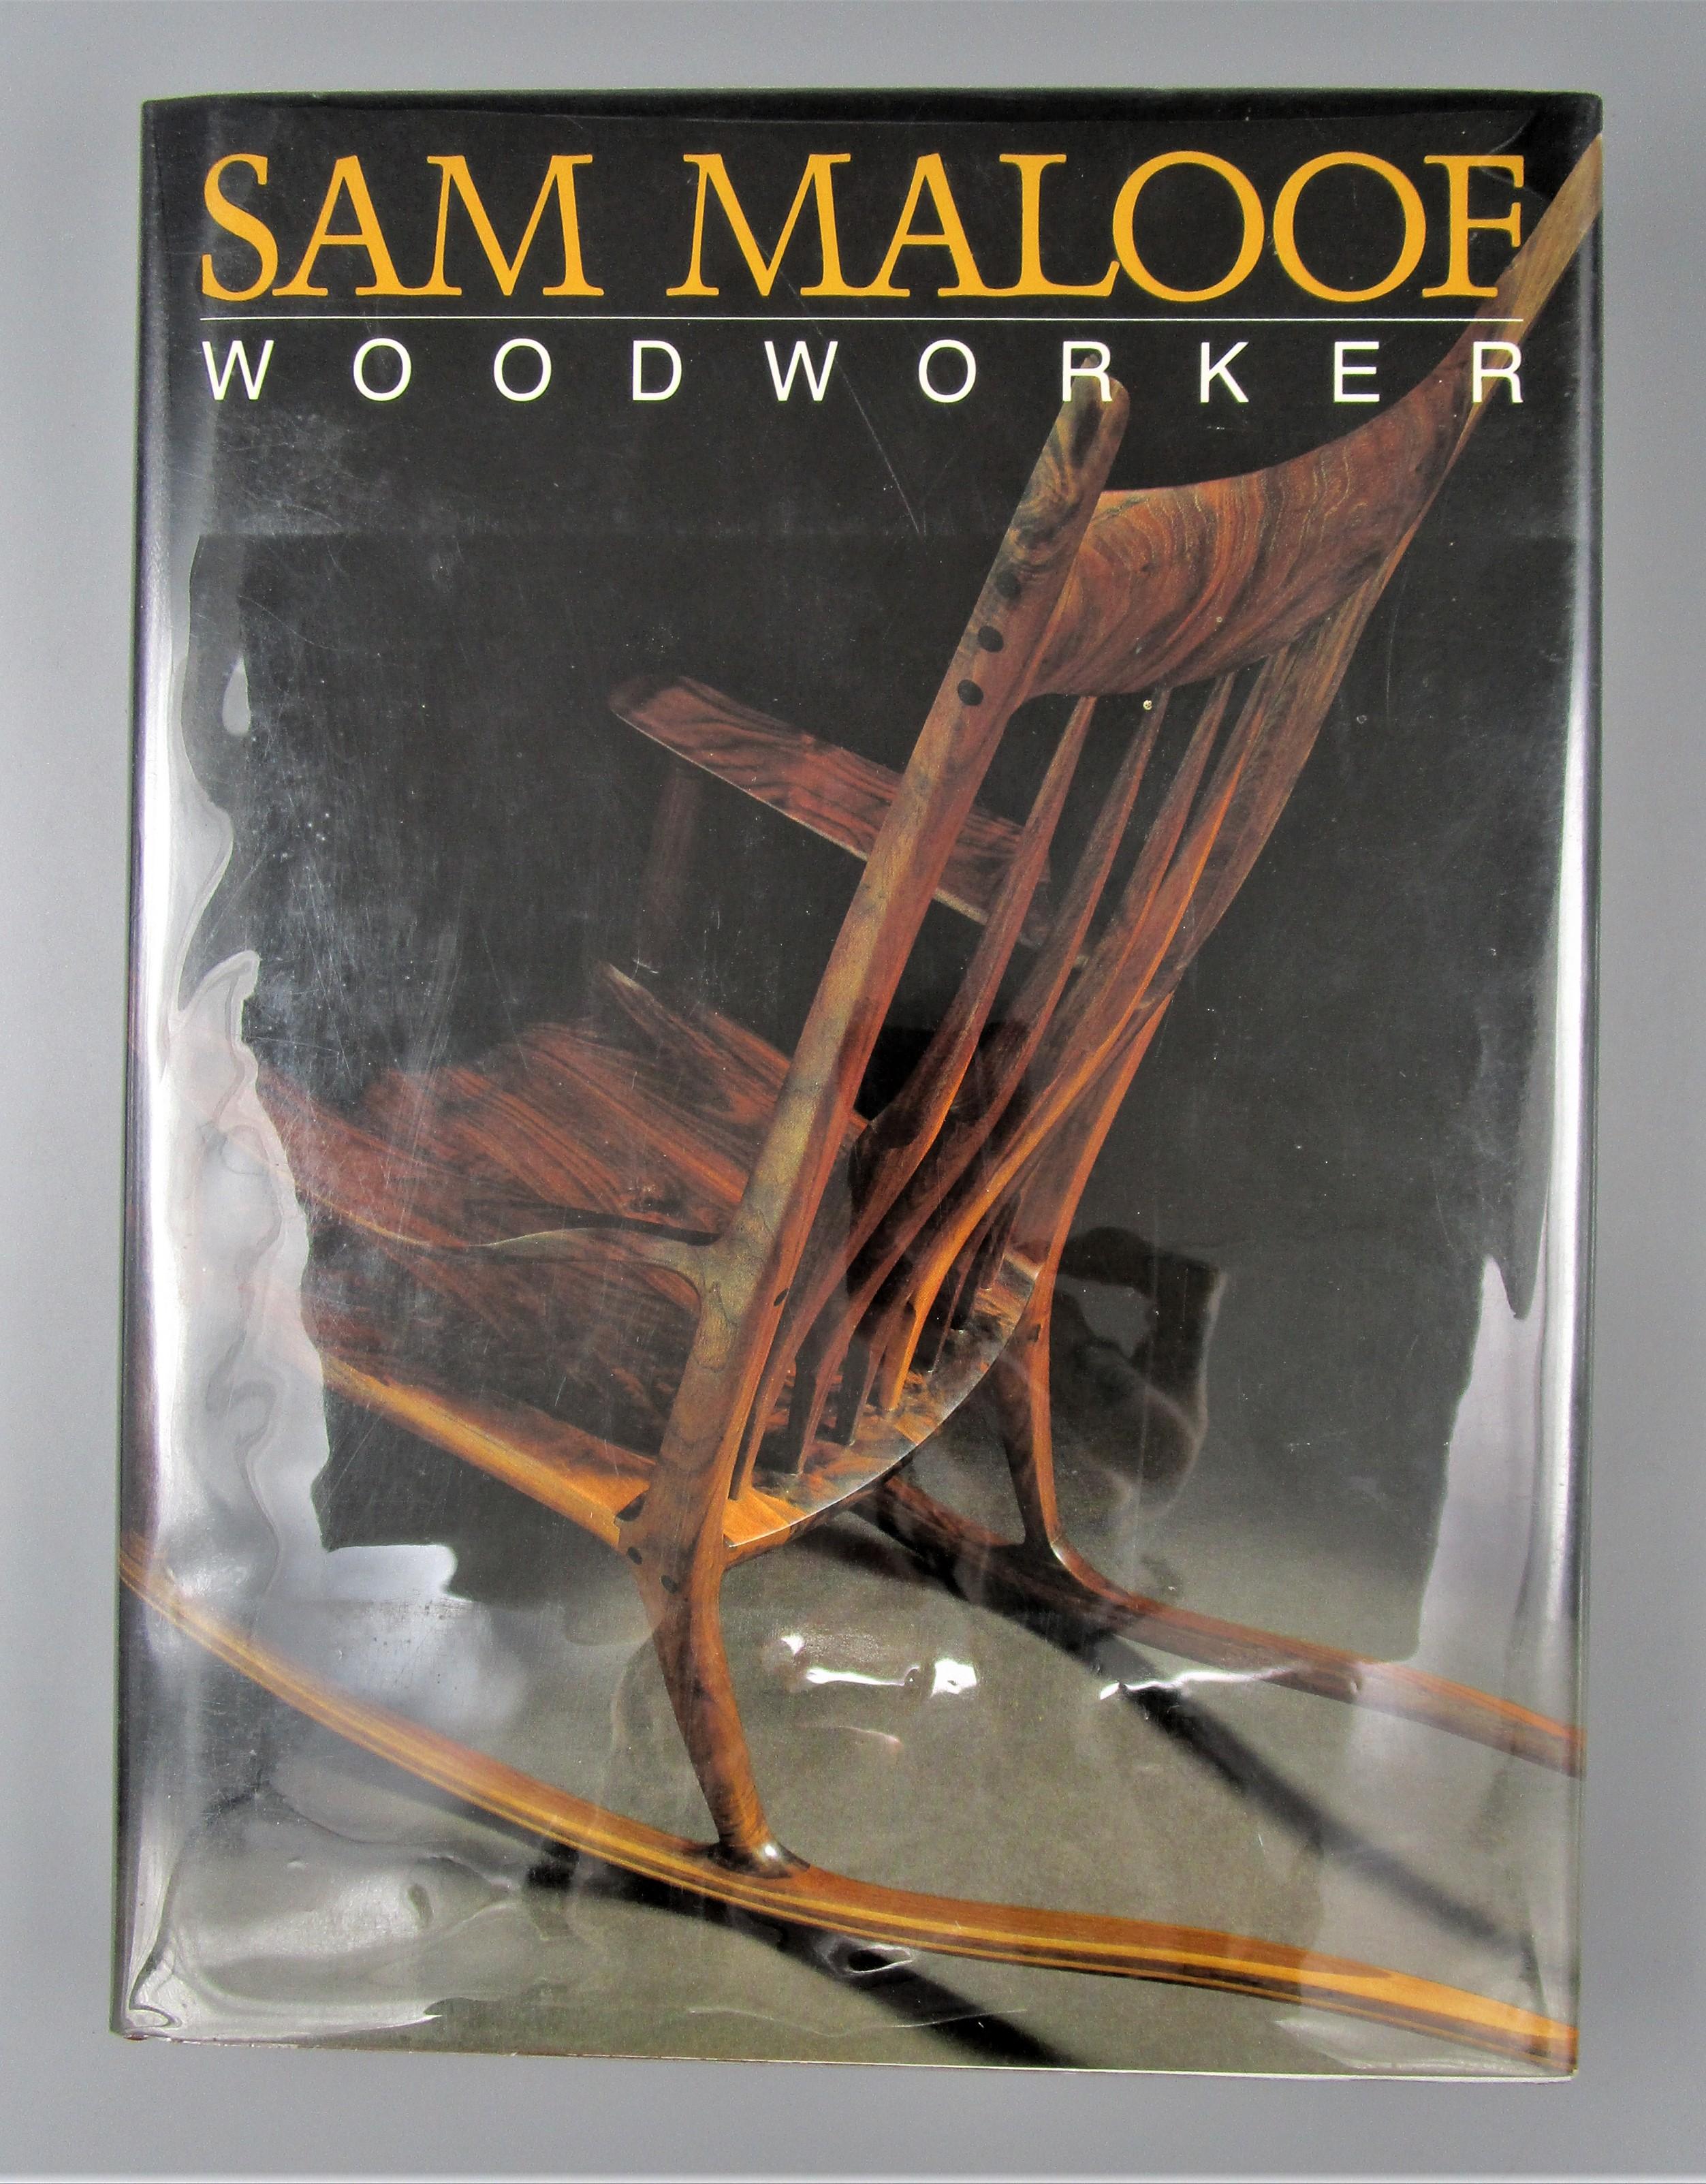 SAM MALOOF: WOODWORKER, by Sam Maloof - 1983 [1st Ed/Signed]